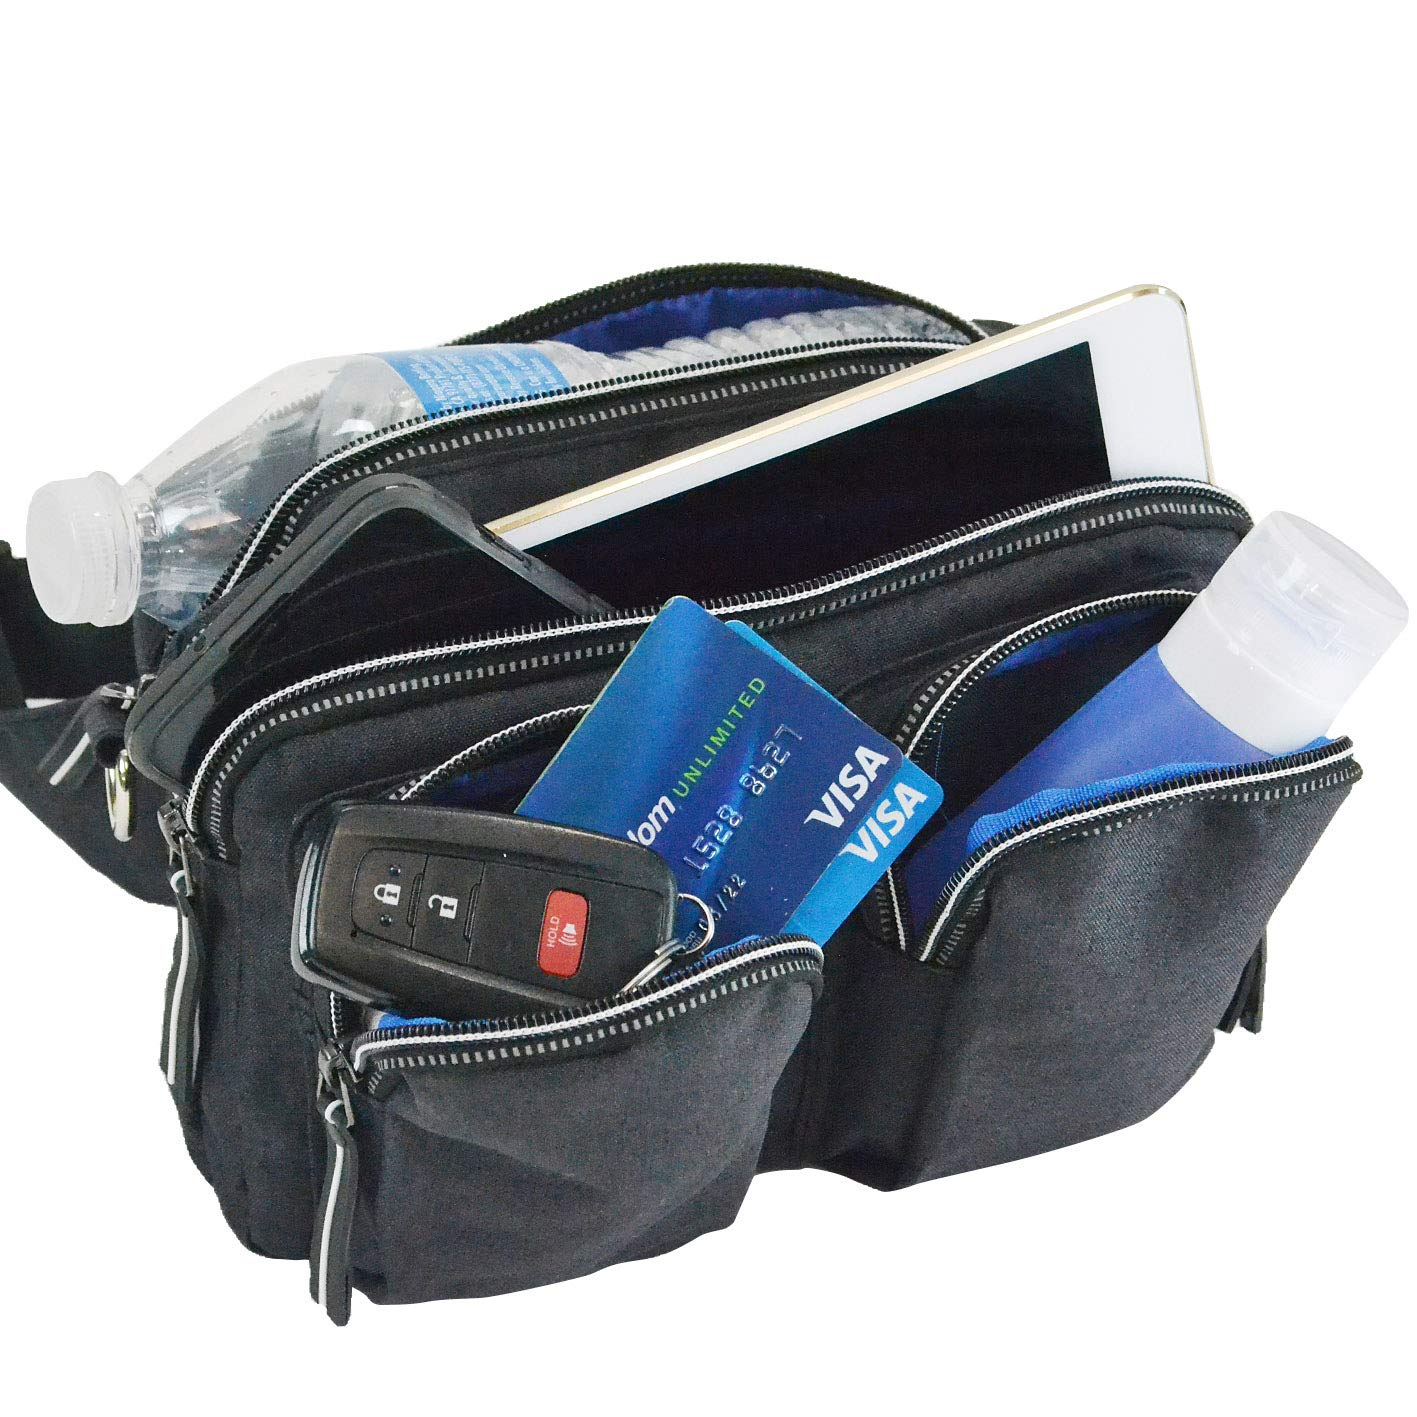 DivaCat Fanny Packs for Women Men Convertible Shoulder Bag Large Size Waist Bag Reflective Zipper Lines